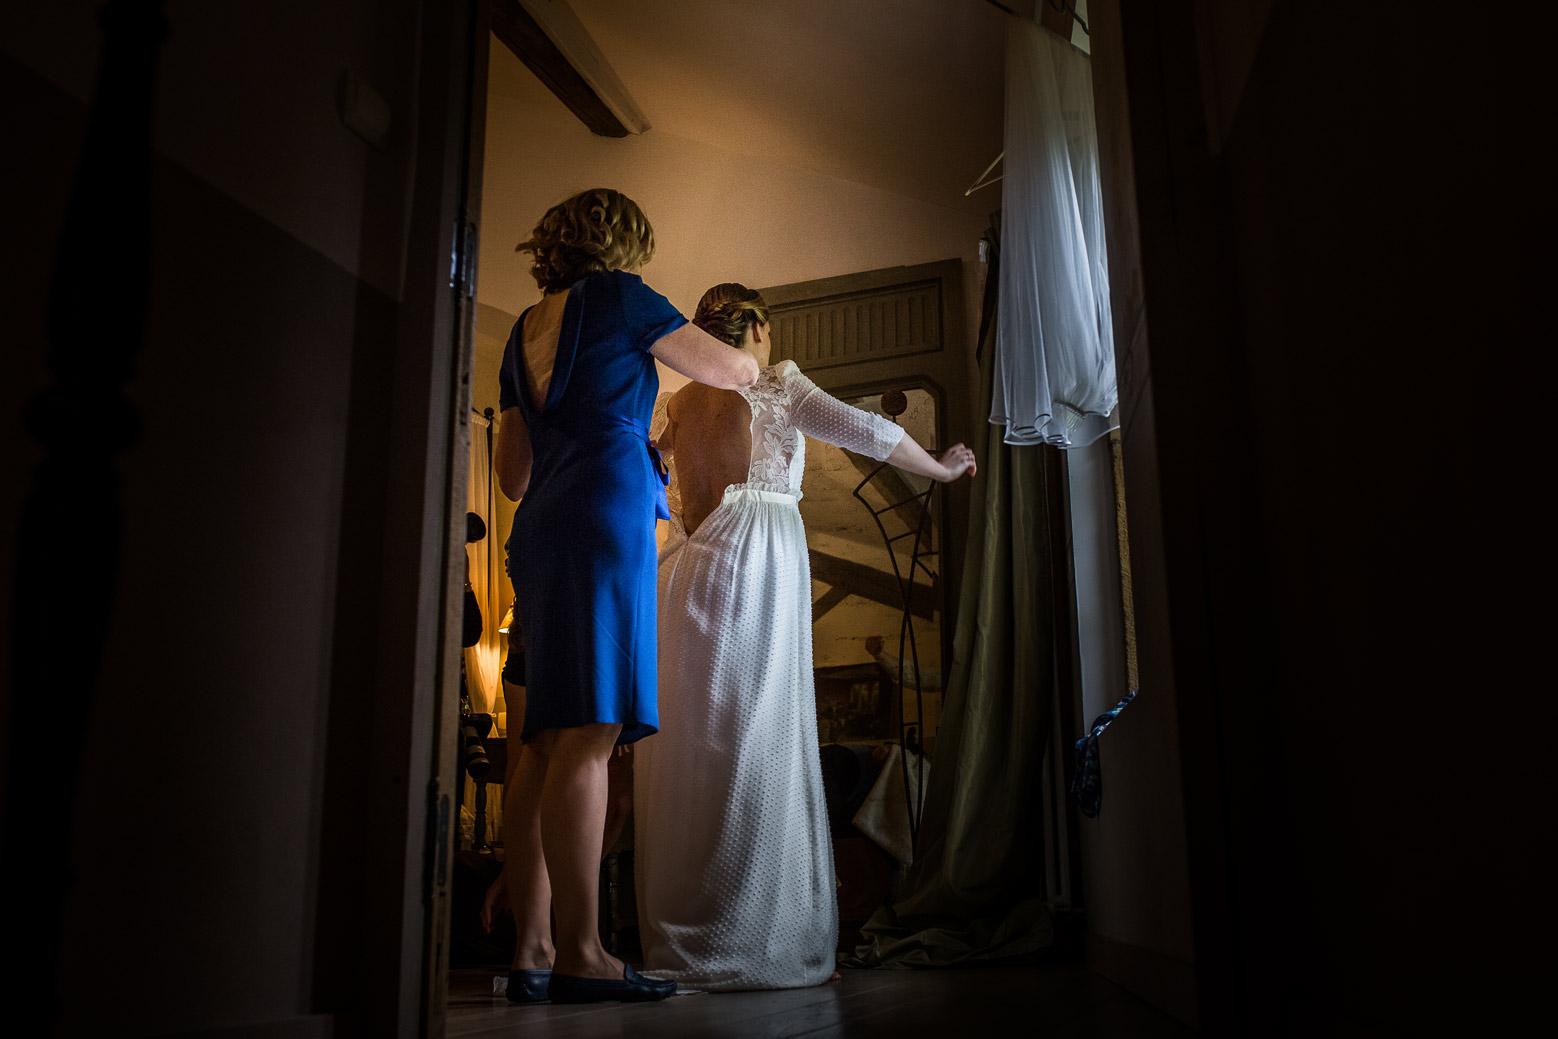 Reportage photo de mariage à Lyon - Manoir de la Garde. La mariée enfile sa robe